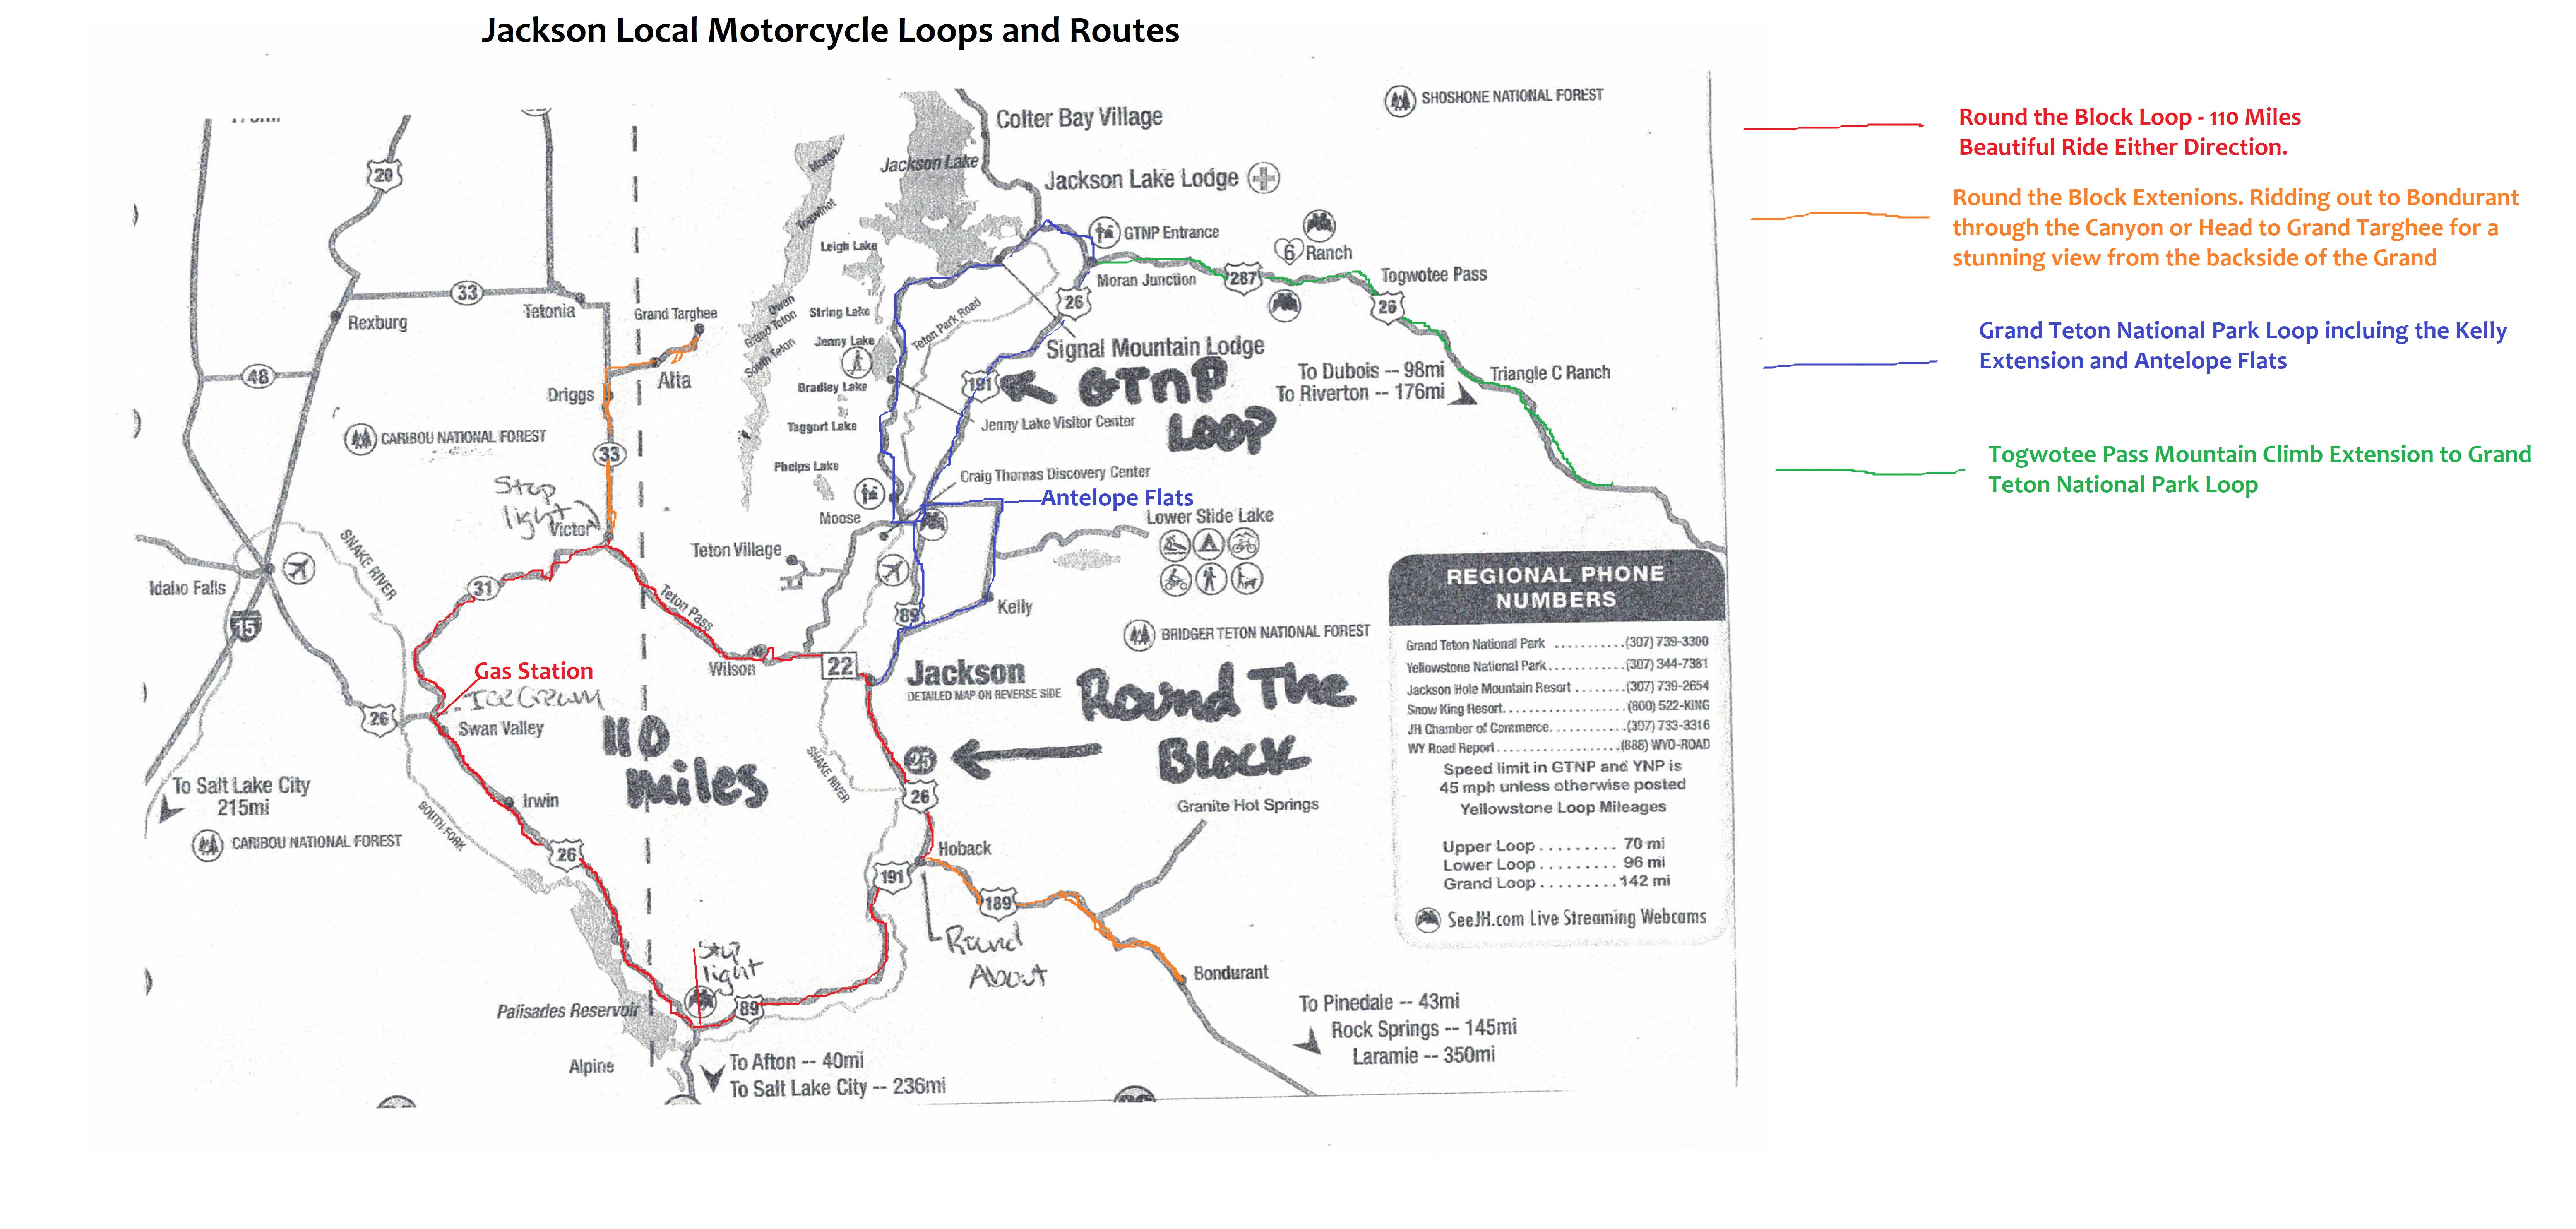 Jackson Hole Wyoming Motorcycle Rentals Harley Davidson Cruise Control Diagram Roundtheblockloop